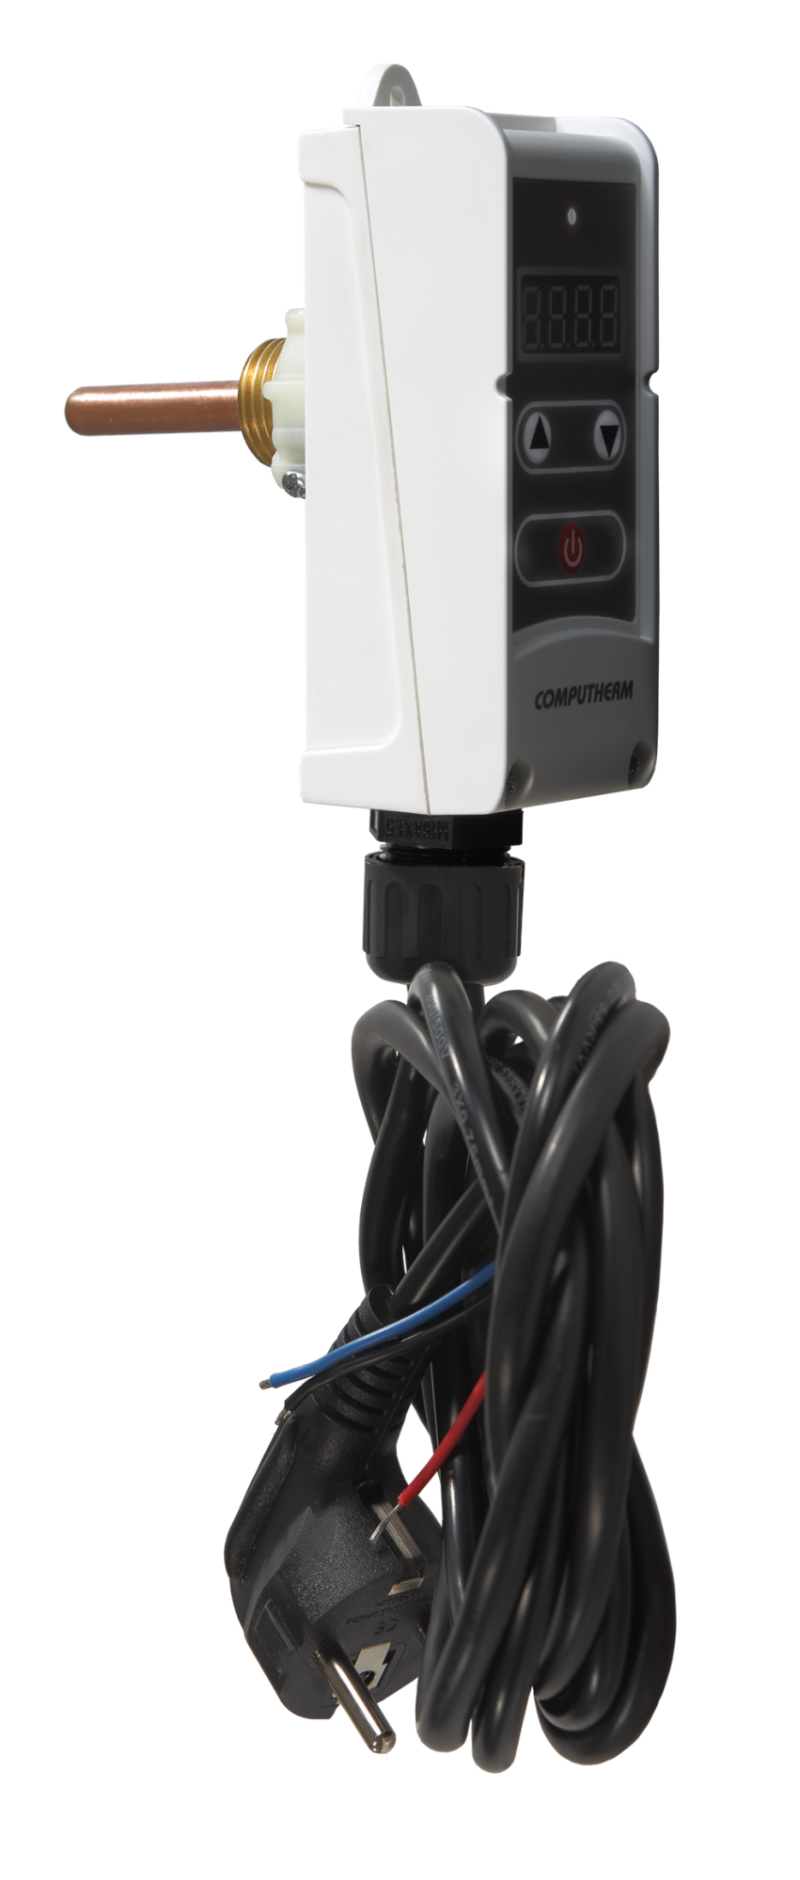 Controler electronic de imersie digital COMPUTHERM WPR-100GE